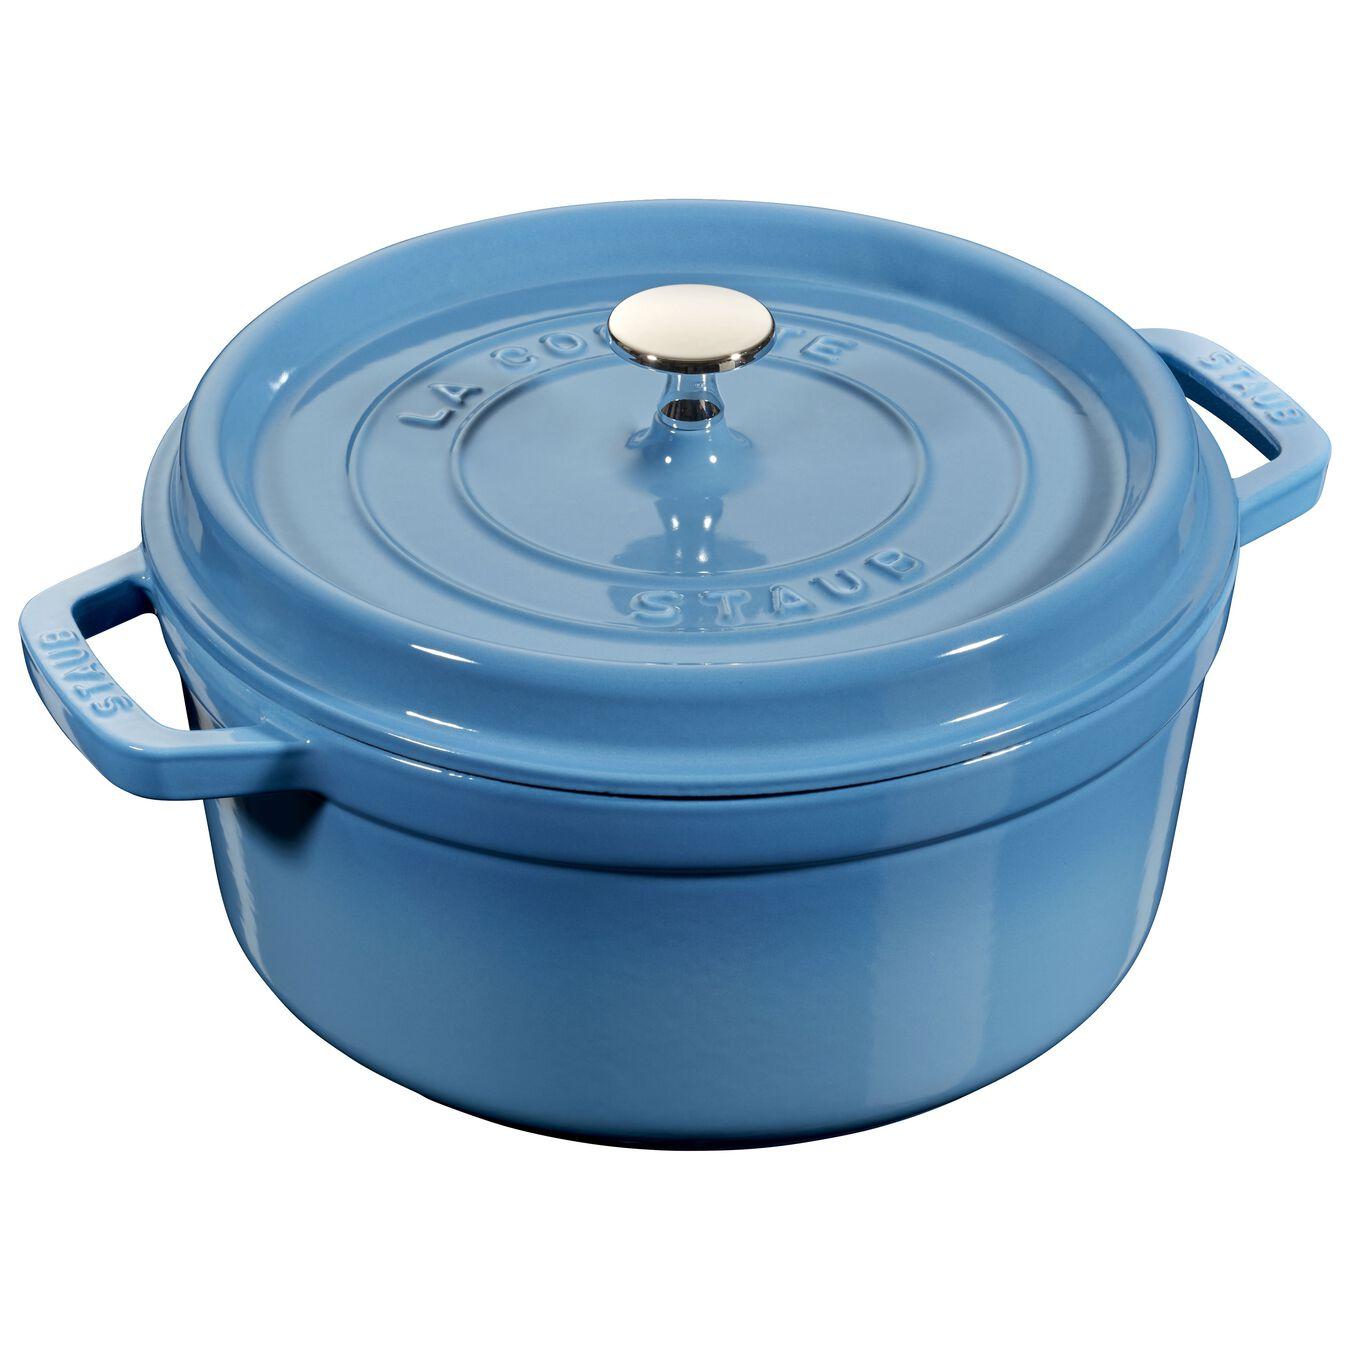 5 qt, round, Cocotte, Ice-Blue,,large 1